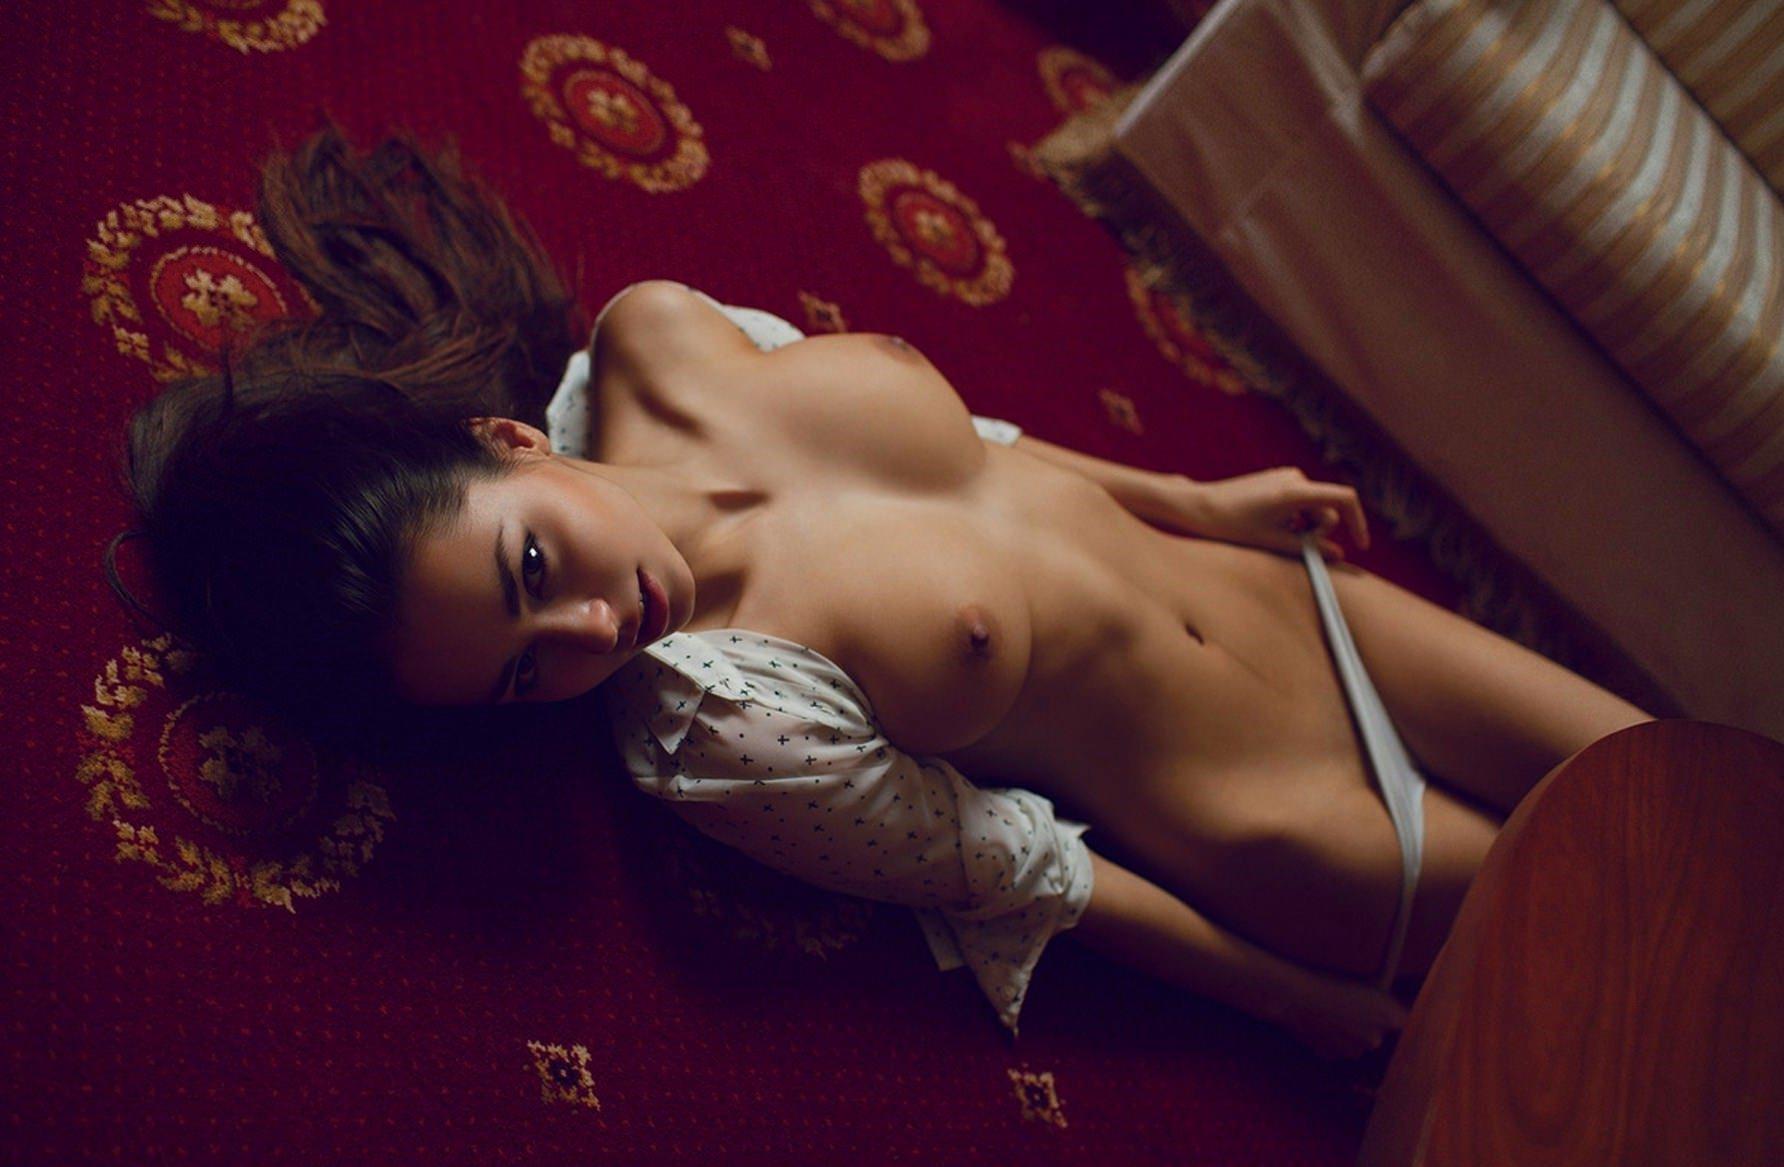 Russian model helga lovekaty pussy topless pics